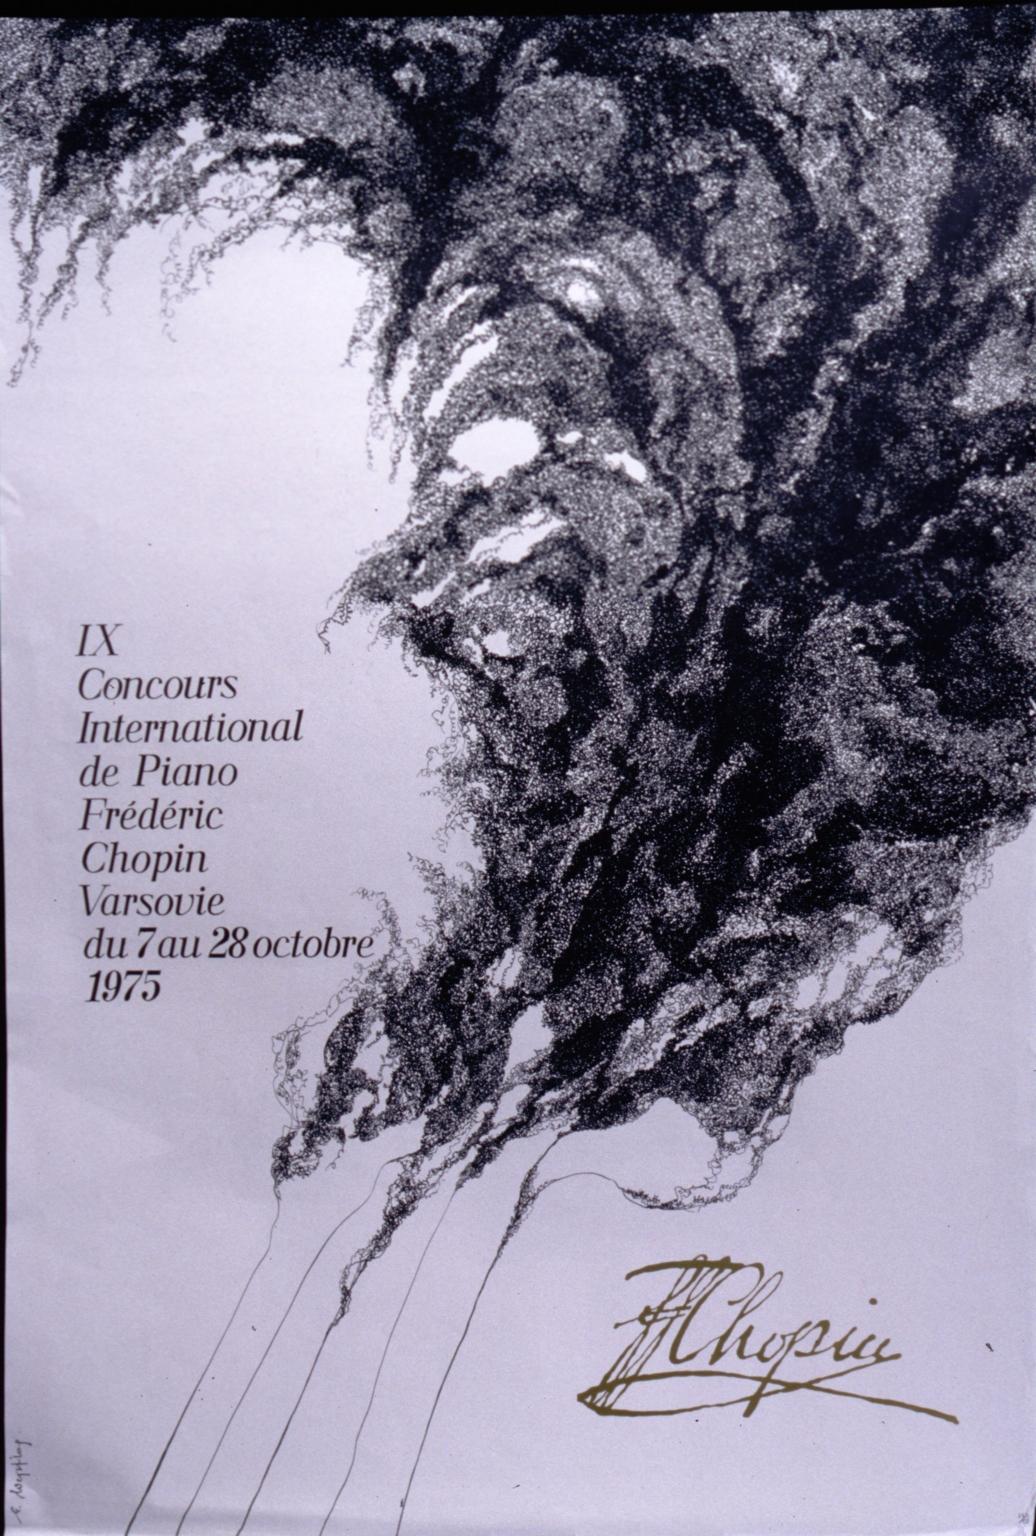 IX Concours international de piano Frdric Chopin, Varsovie, du 7 au 28 octobre 1975